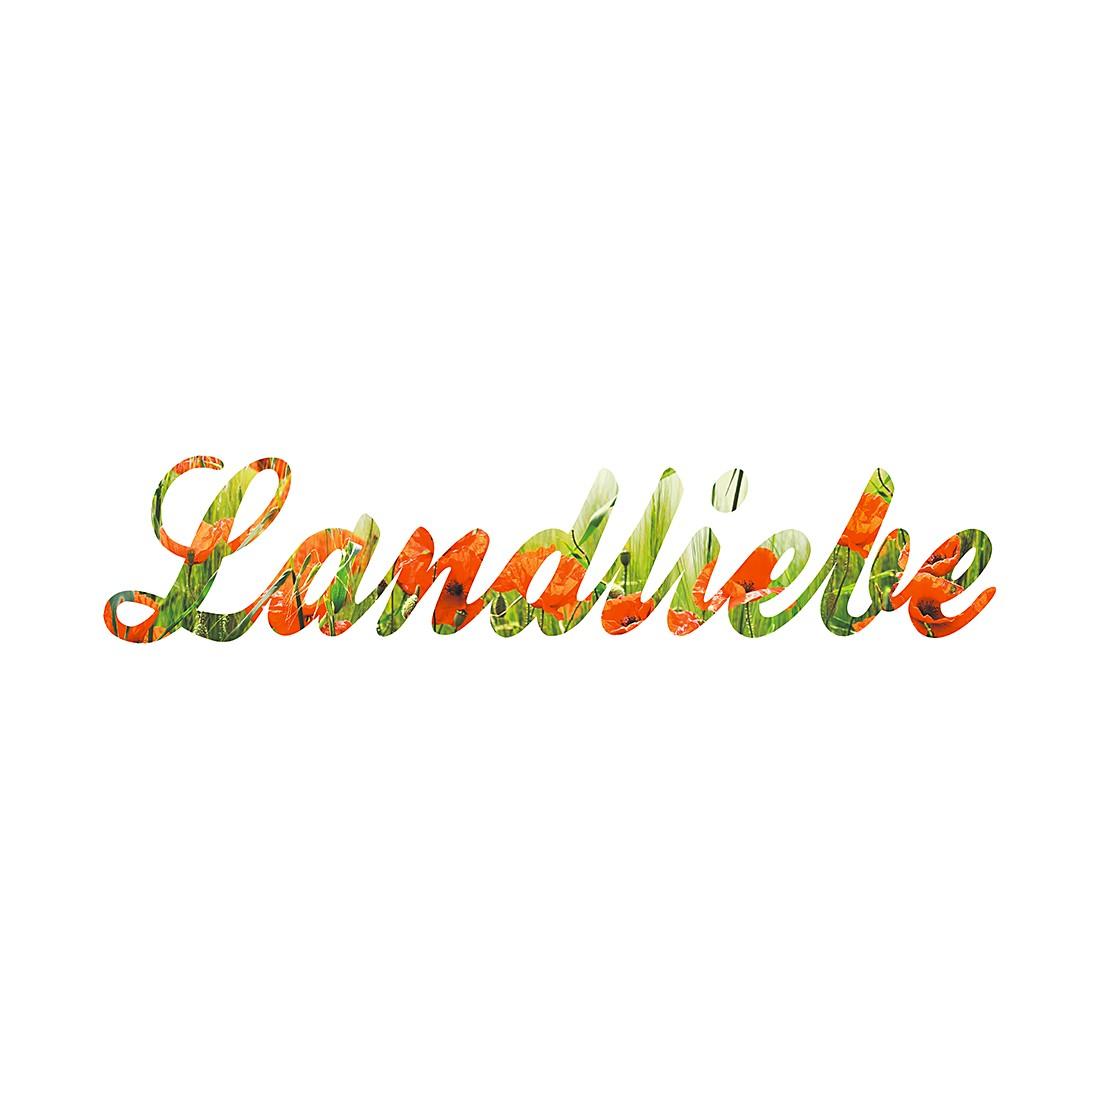 Wandbild Landliebe, Pro Art